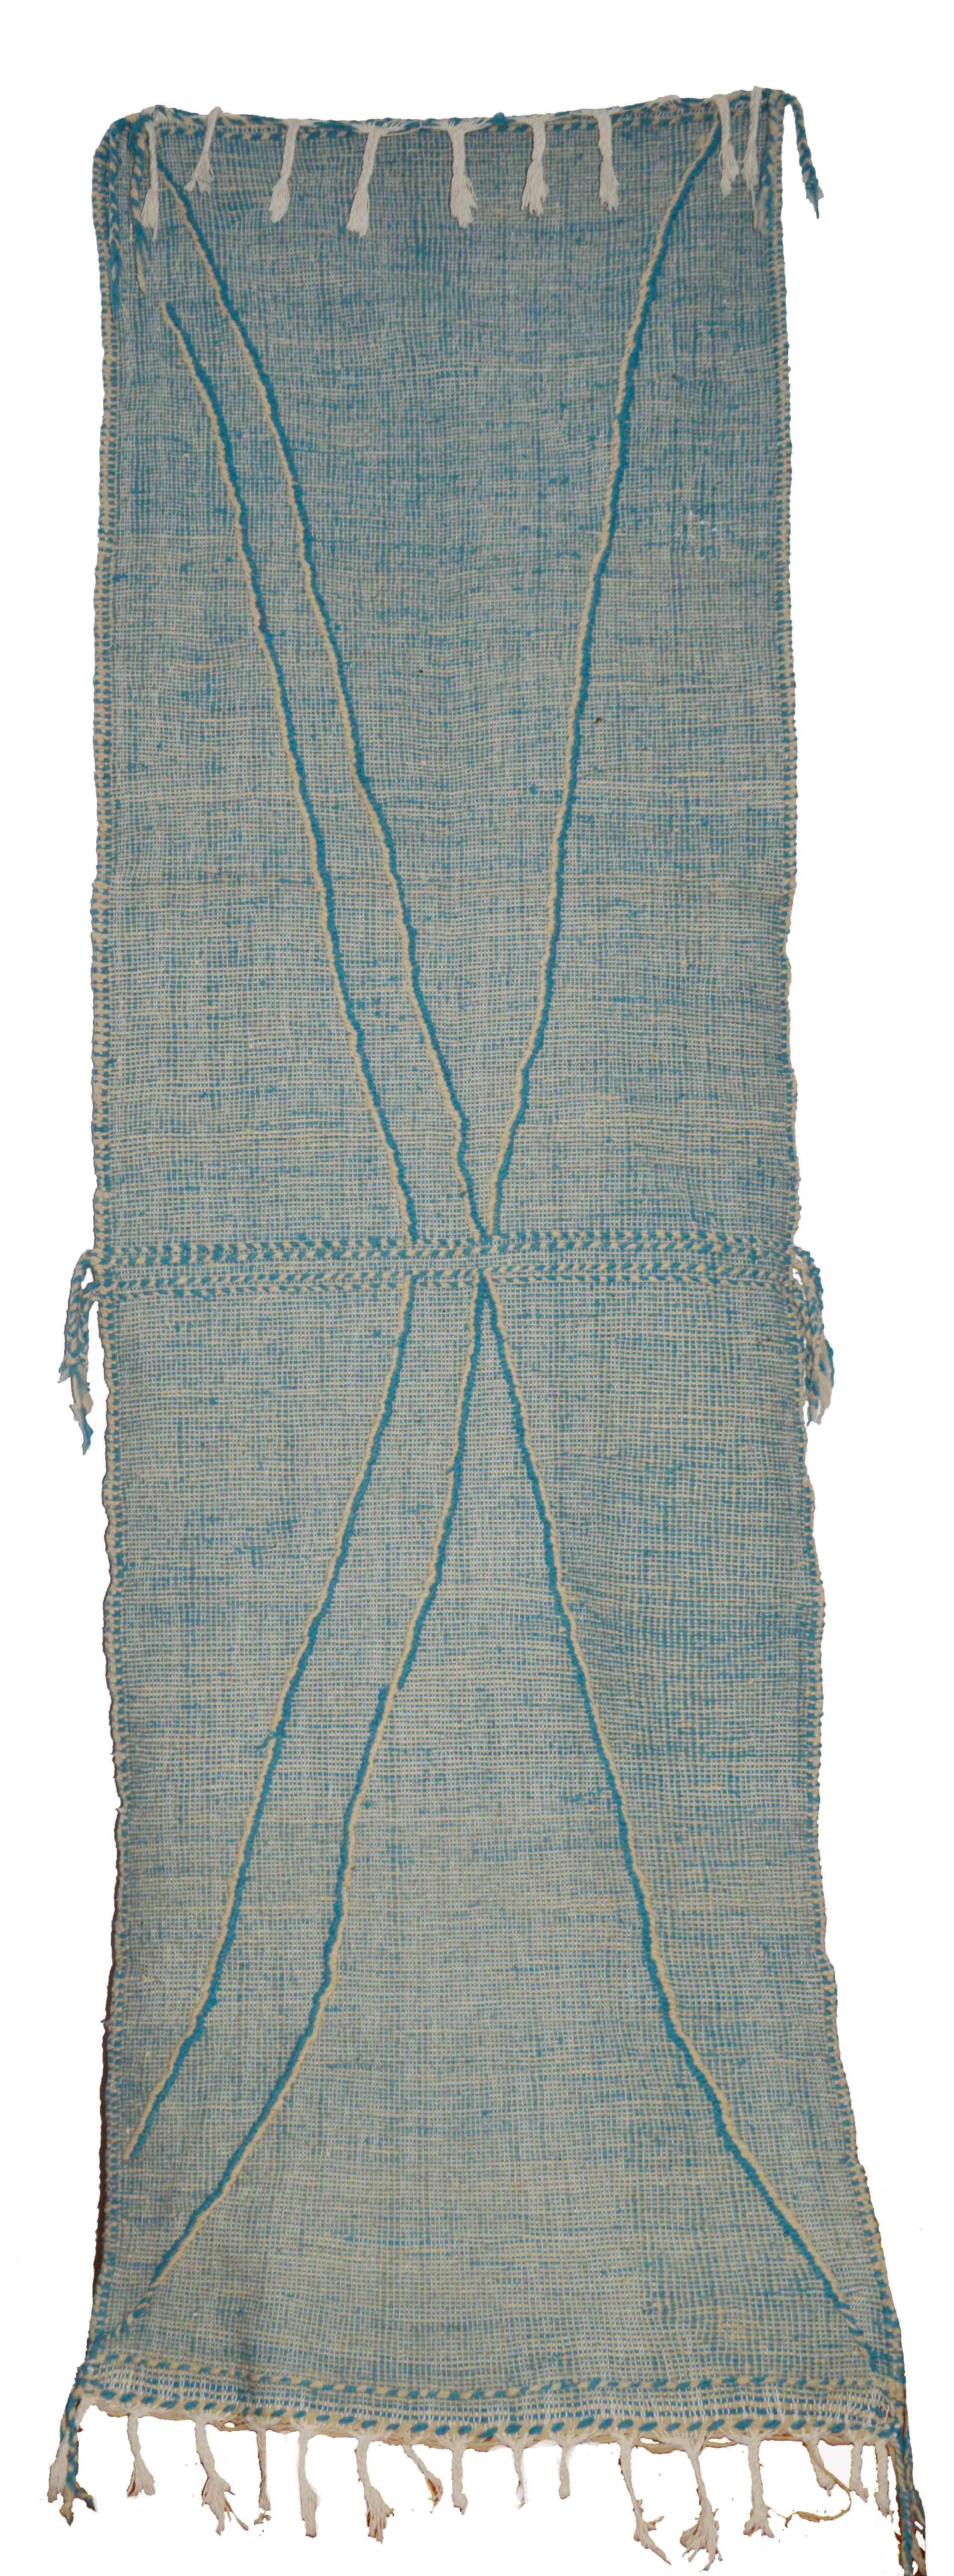 Kelimläufer KL05  - 300 cm x 95 cm